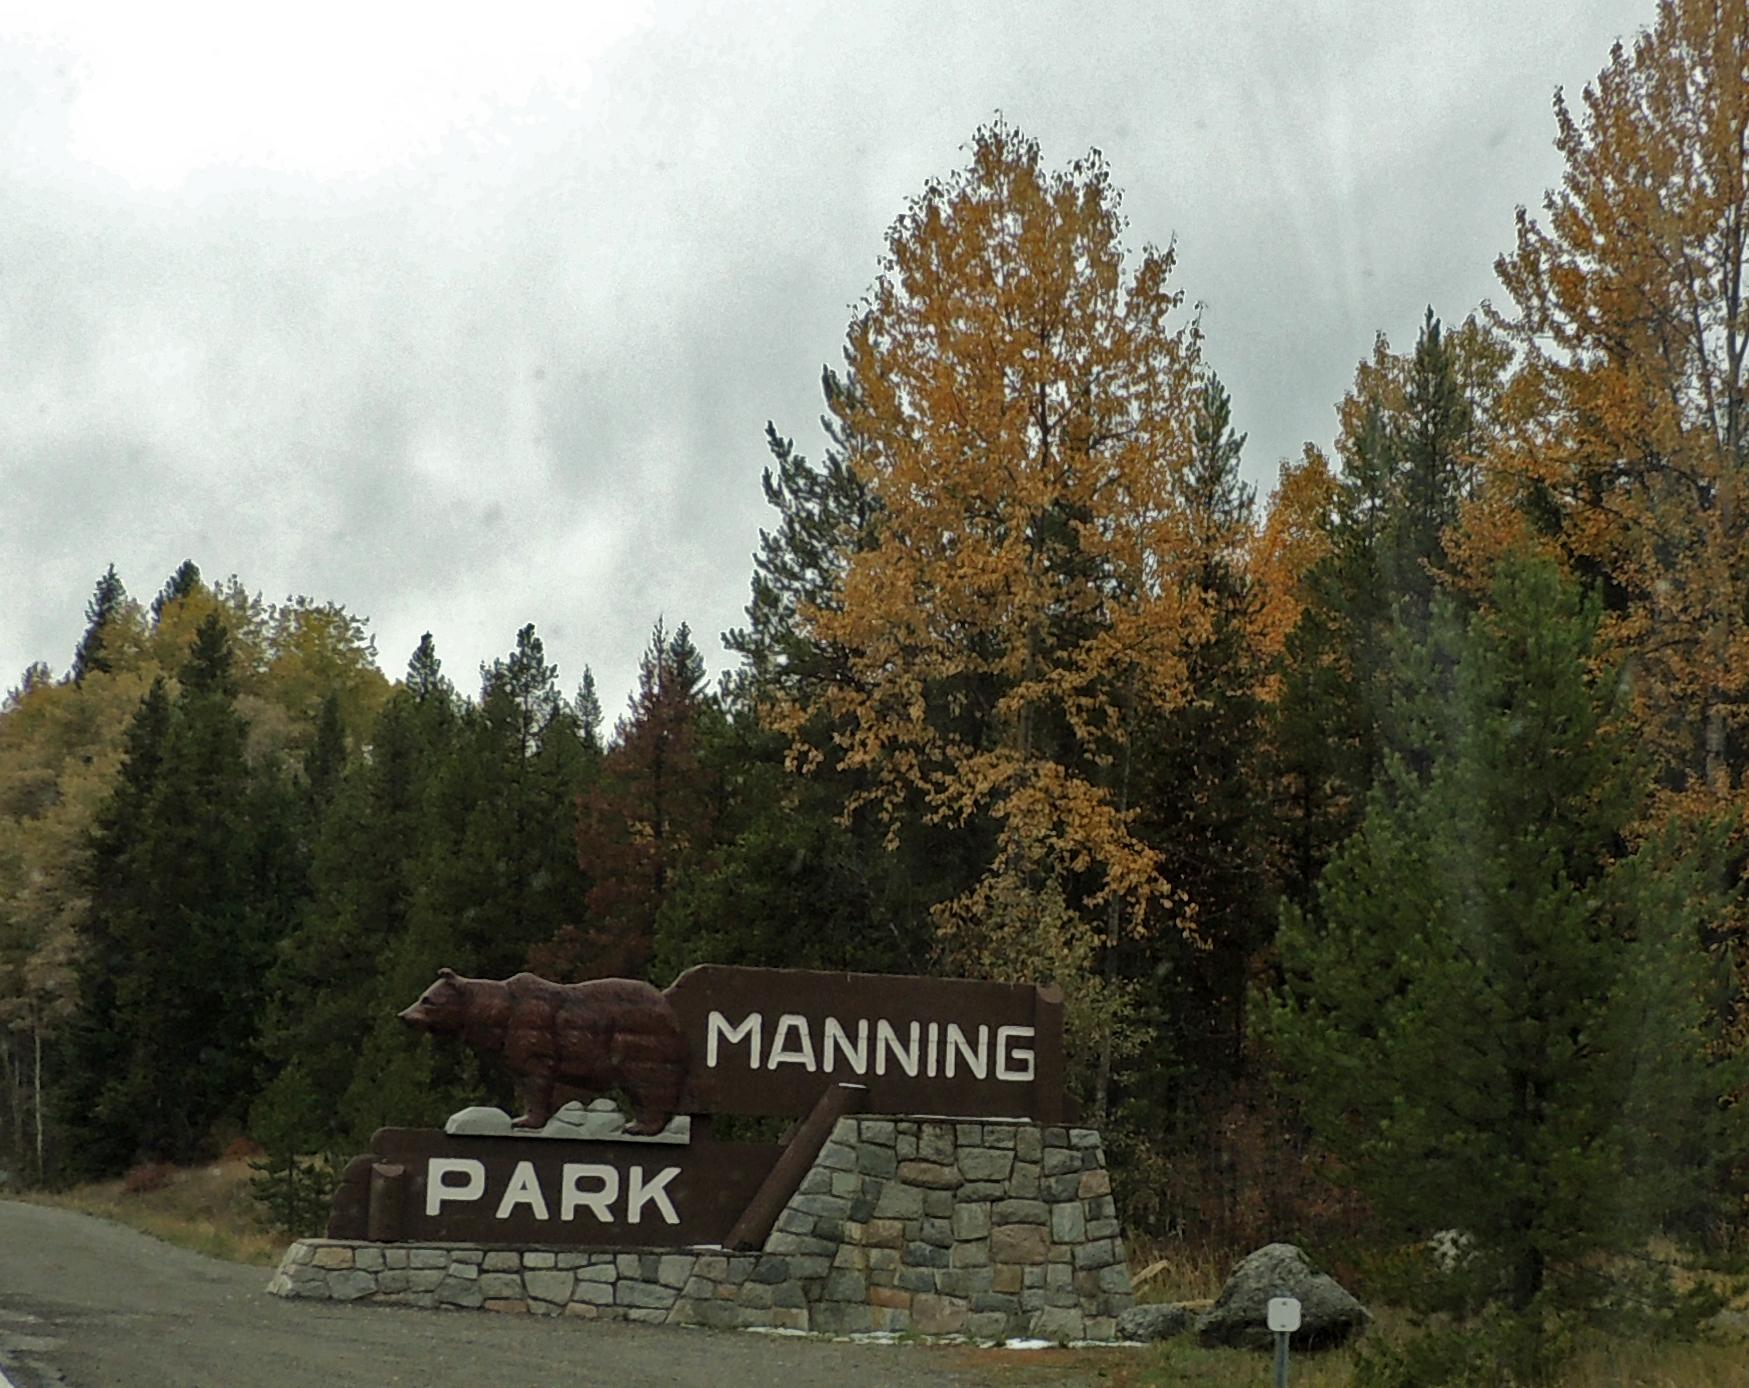 Manning Park